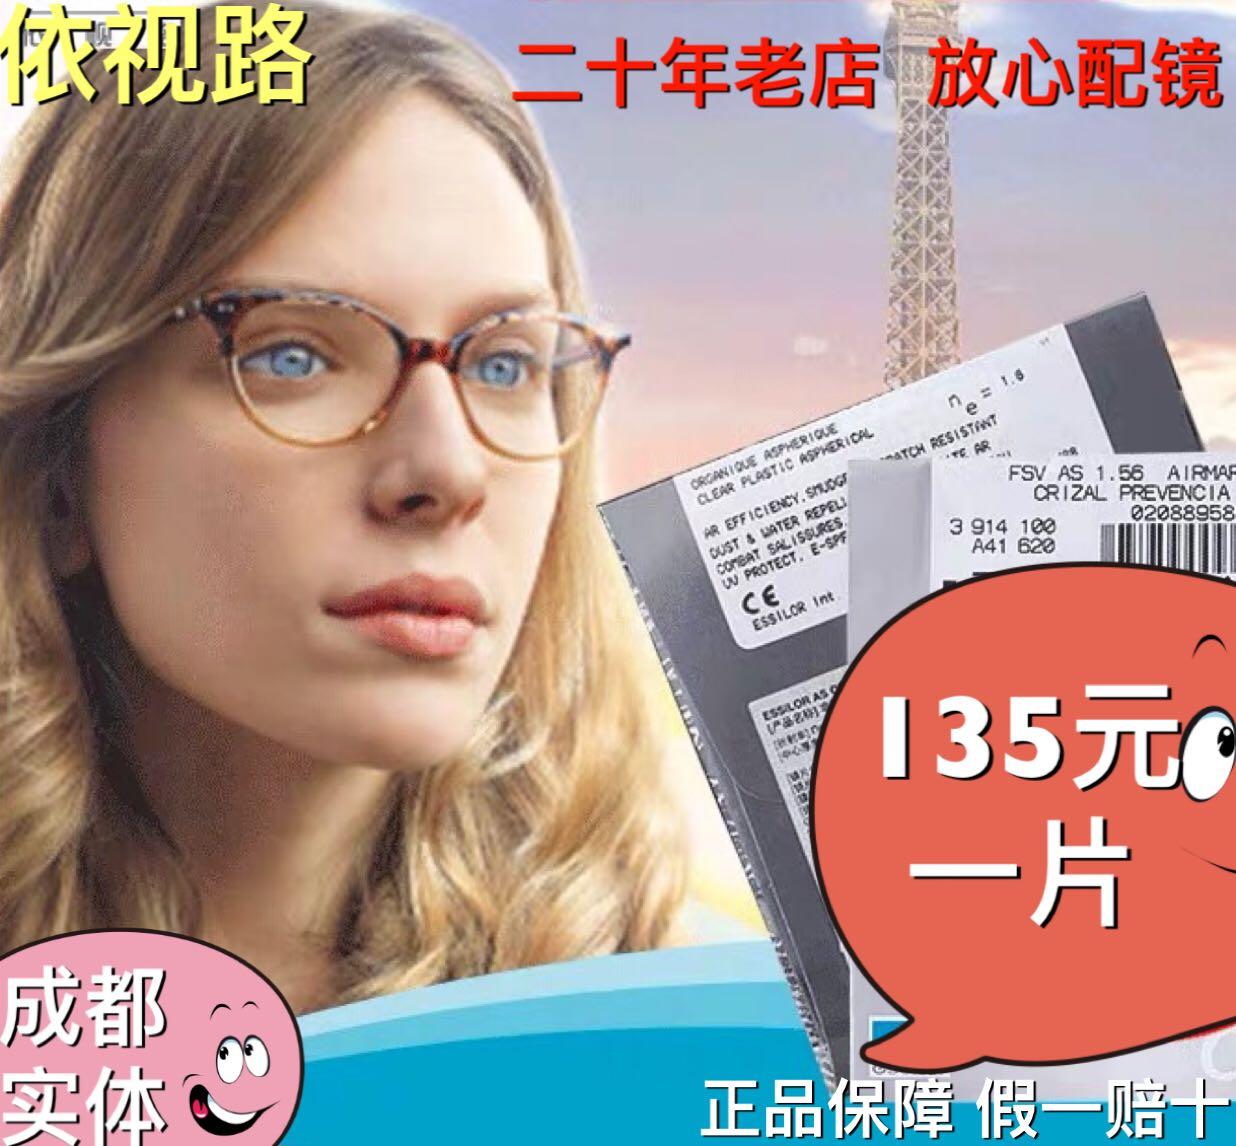 Ultra thin aspherical myopia lenses: A3 A4 anti blue light 1.74